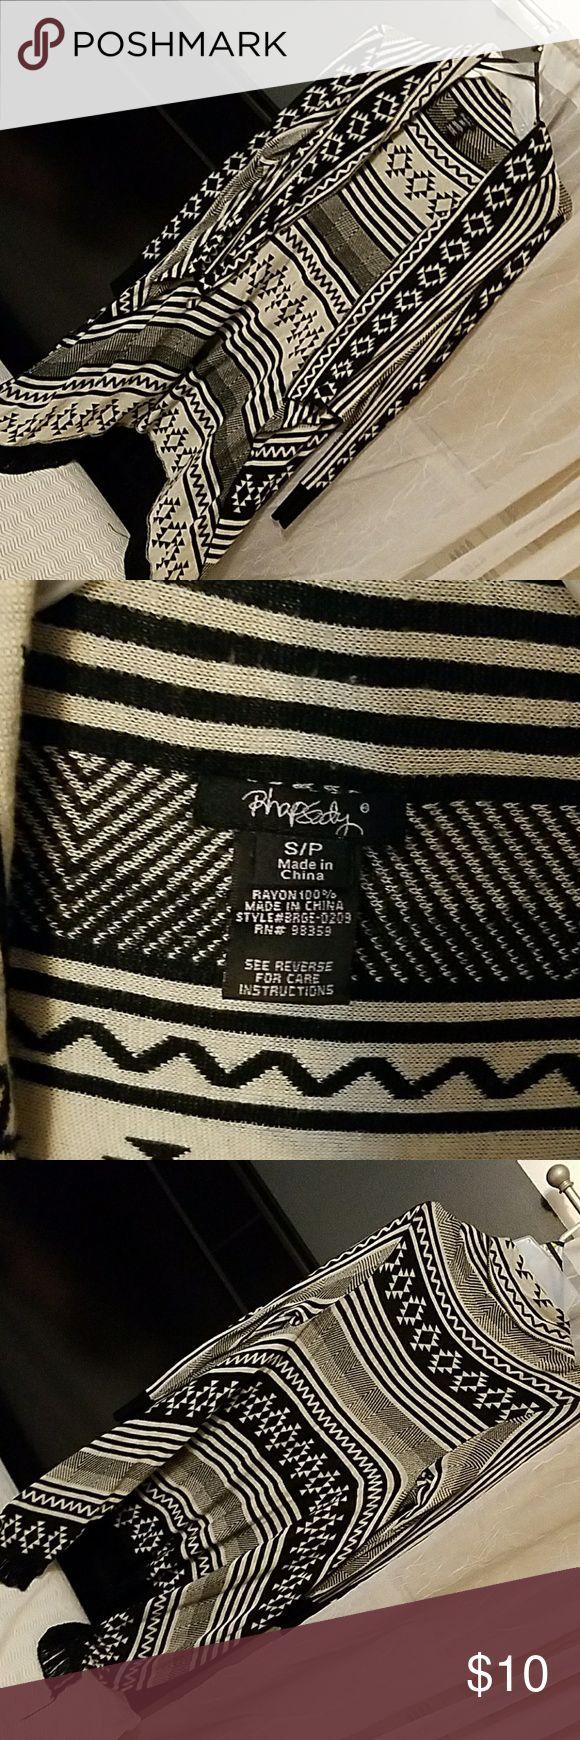 Tribal print cardigan Flowy, lightweight, tribal print cardigan. Rhapsody Sweaters Cardigans